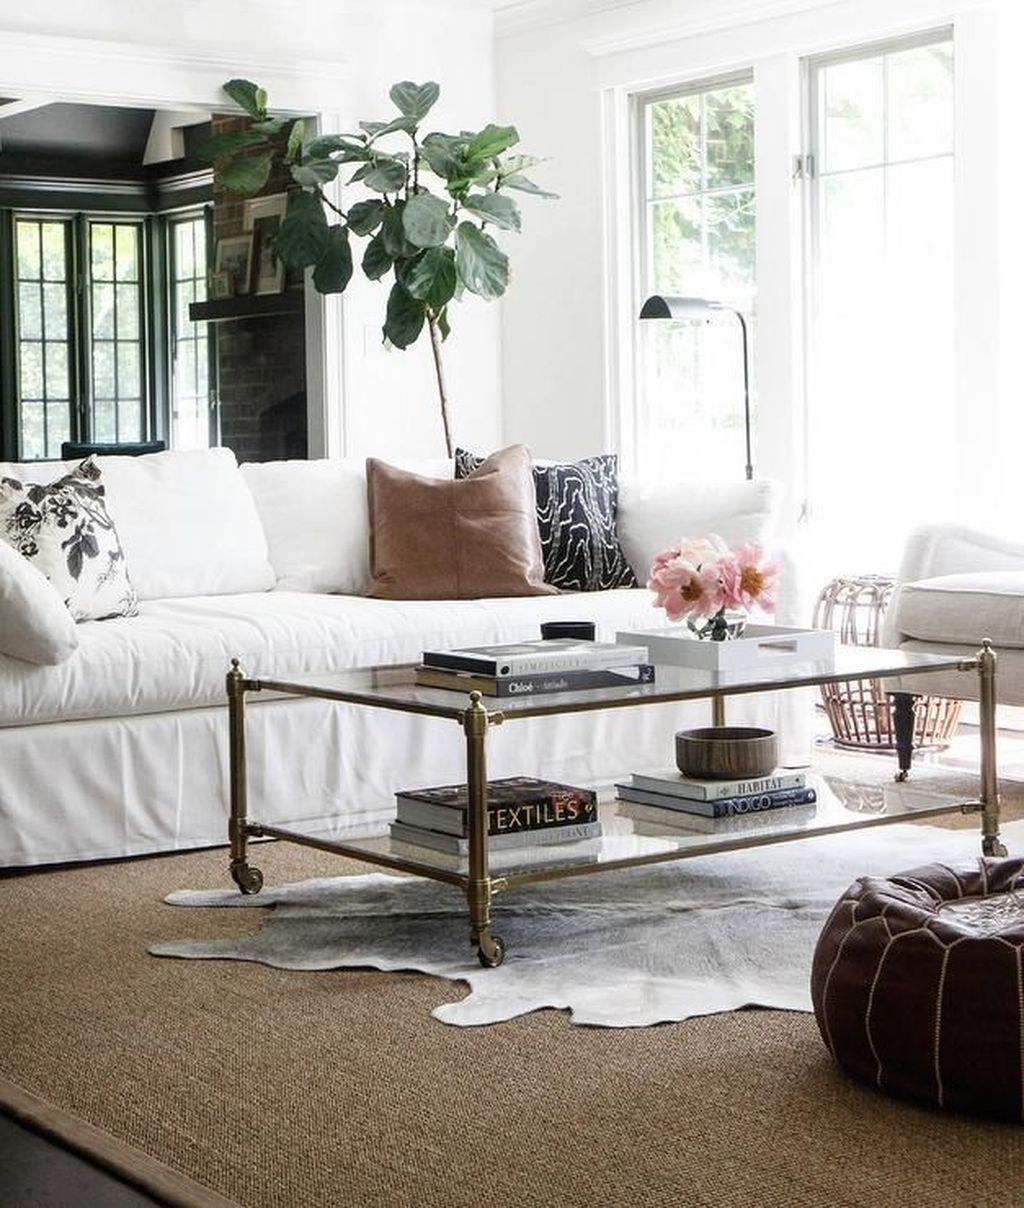 Perfect Farmhouse Sofa Table Ideas To Decorating Your